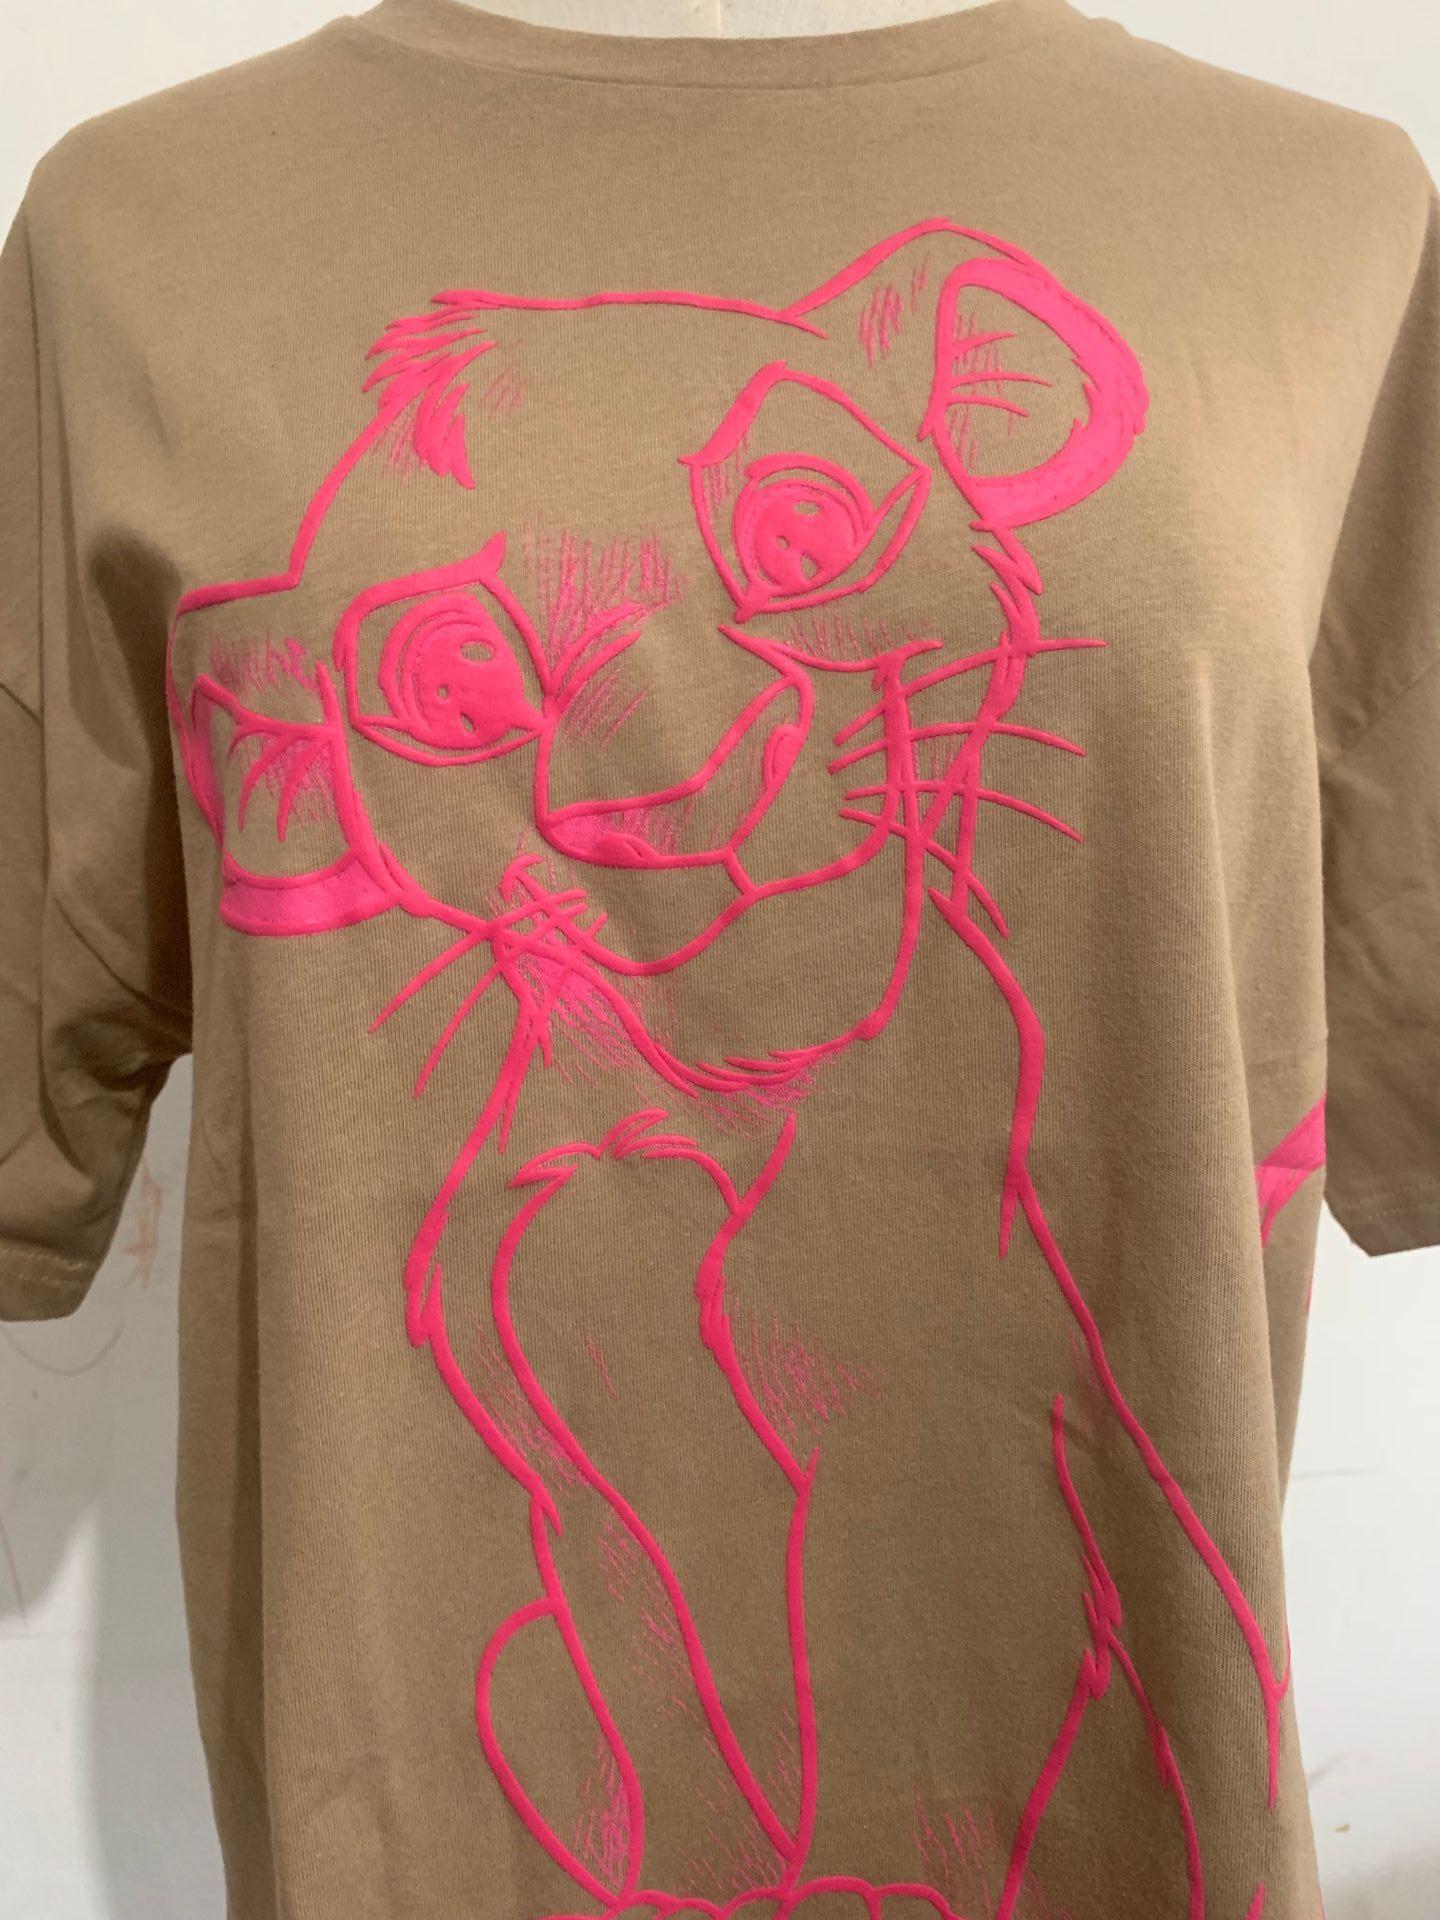 H1af38f08310b49dbb44a2458f2ae05e1O Disney Family T-Shirt Fashion Winnie the Pooh Mickey Mouse Stitch Fairy Dumbo SIMBA Cartoon Print Women T-Shirt Cotton Tee s